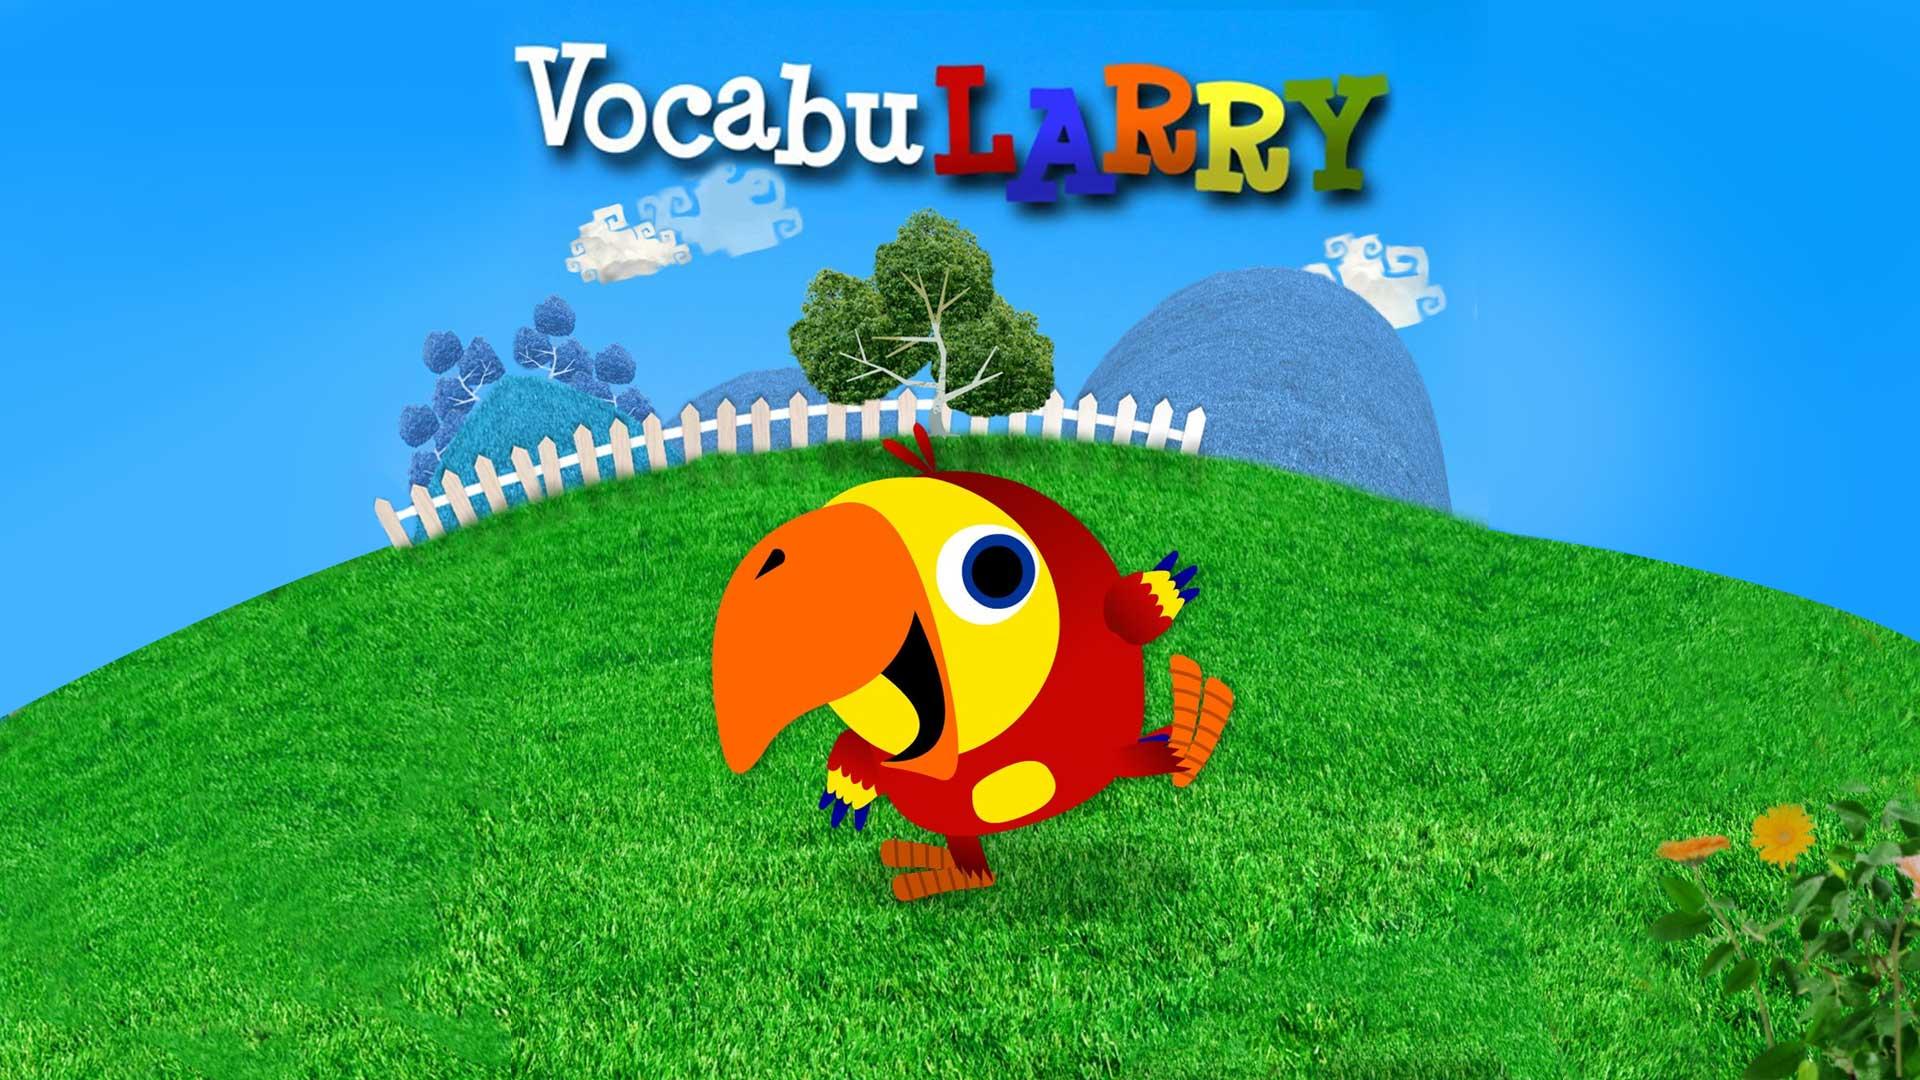 VocabuLarry